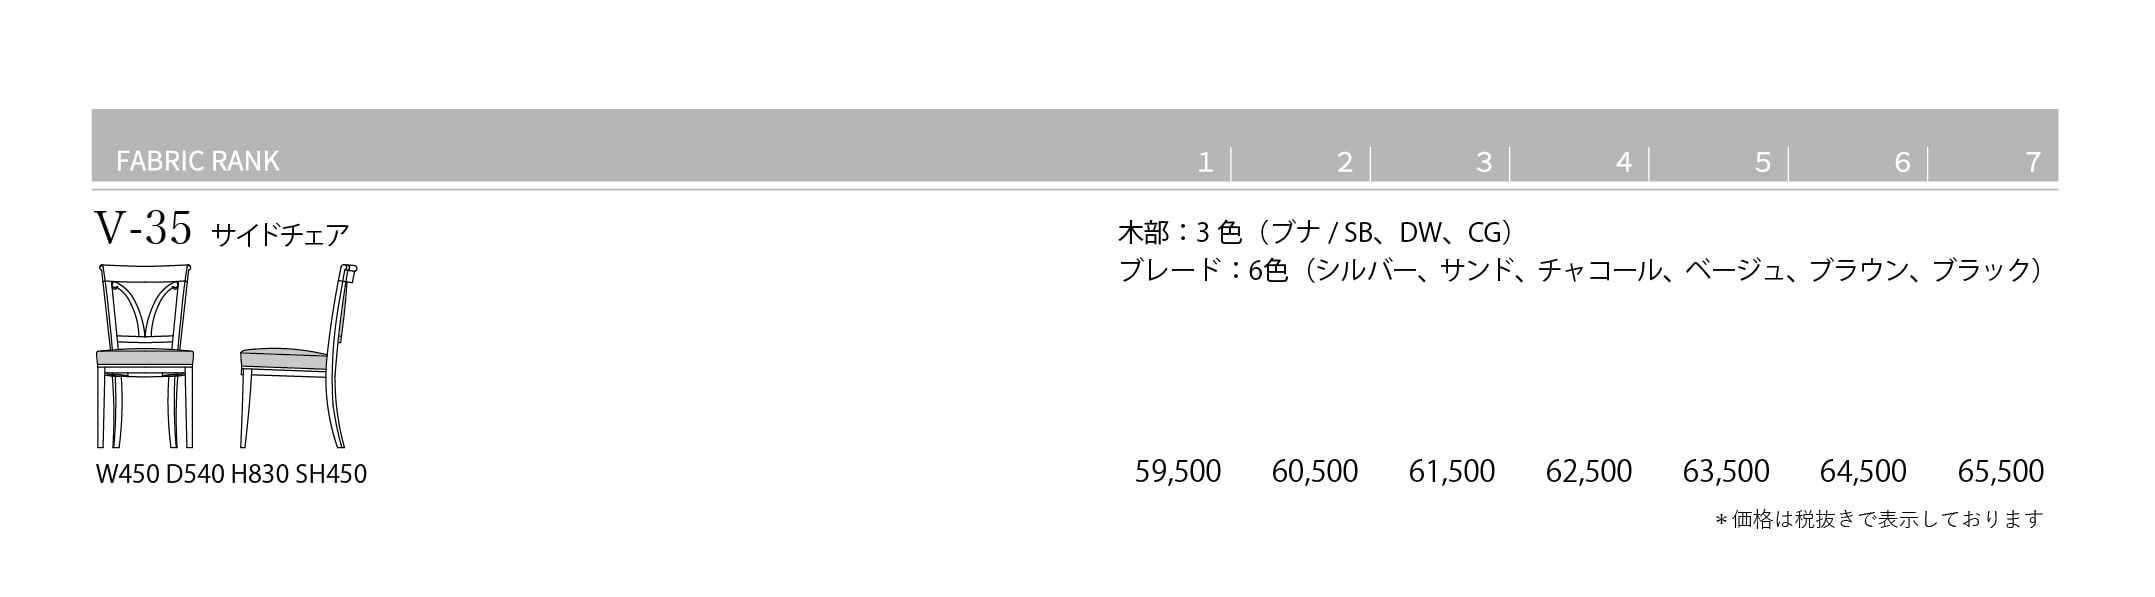 V-35 Price List